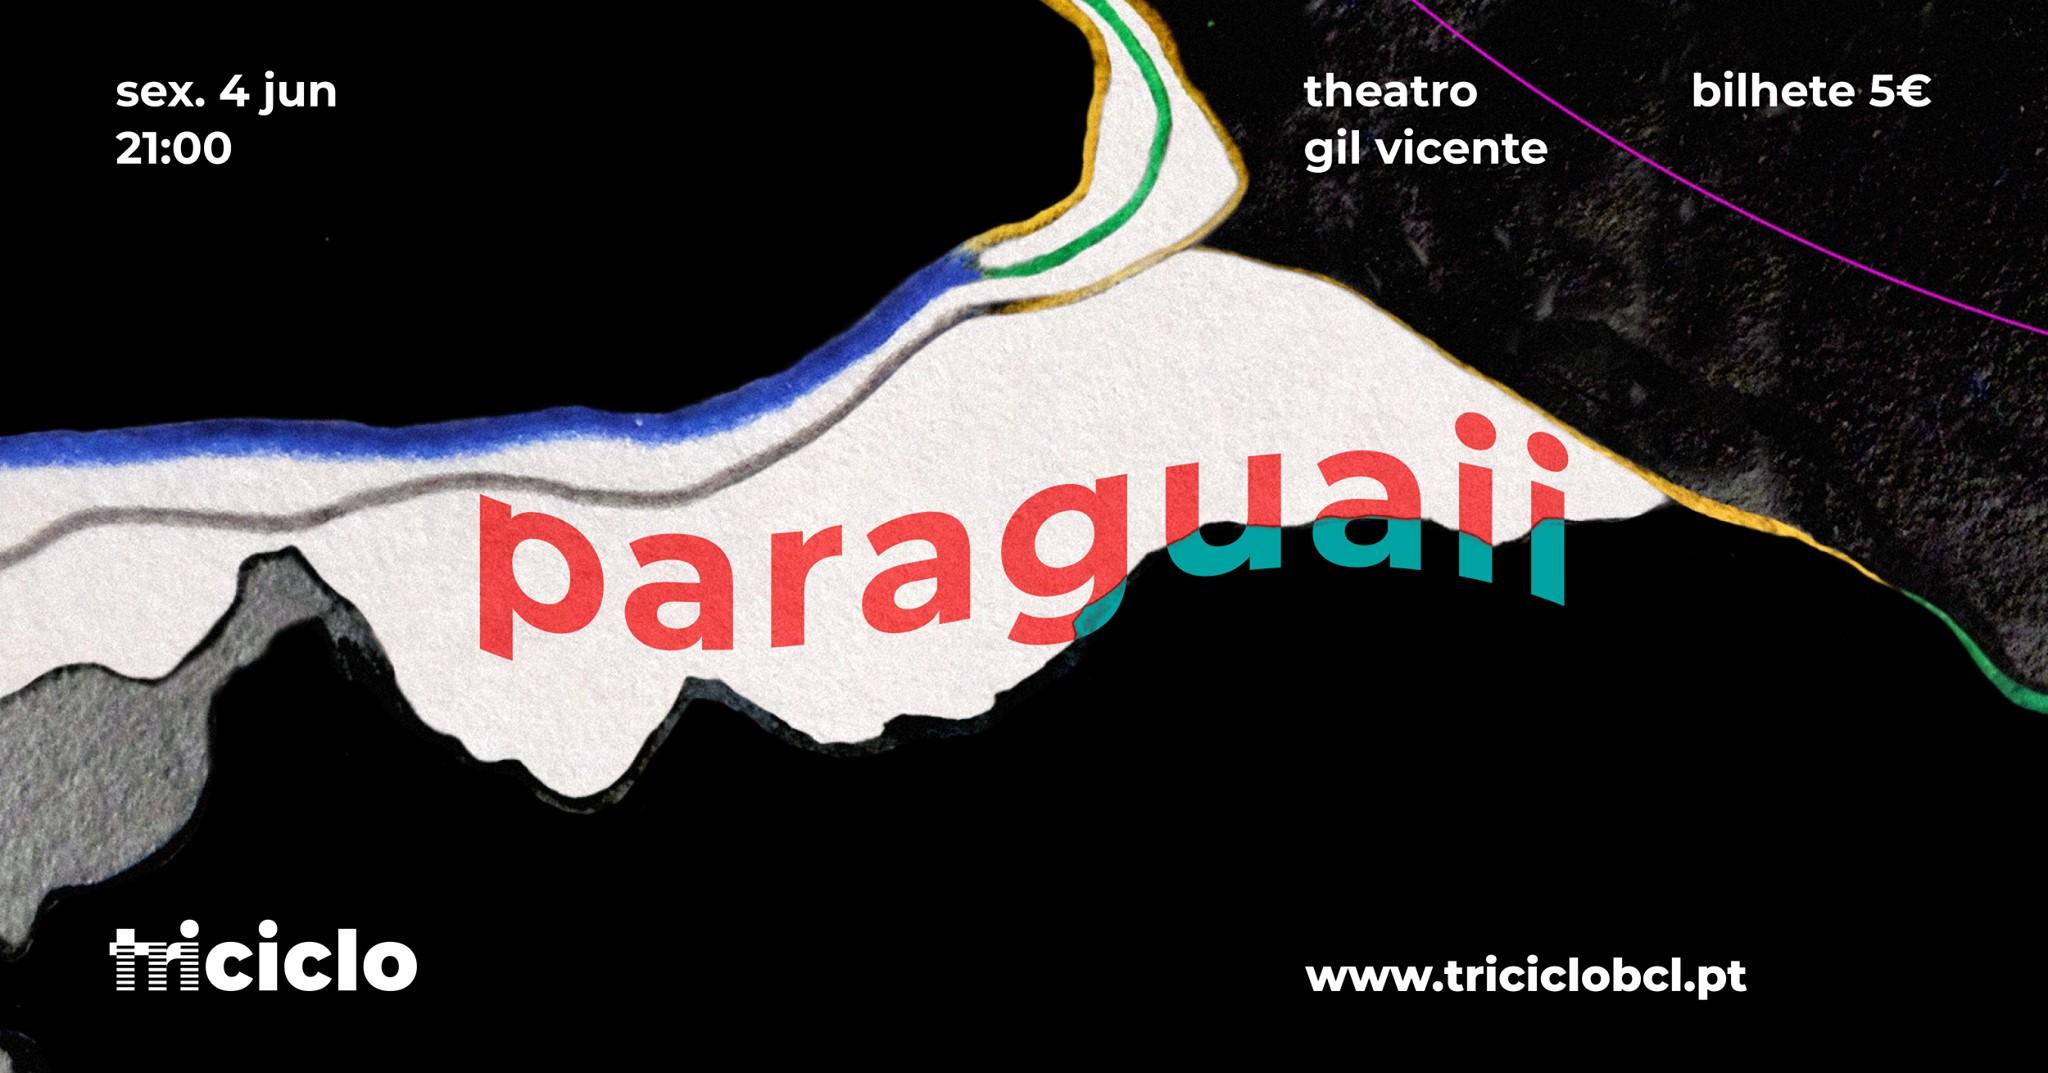 triciclo / paraguaii no theatro gil vicente